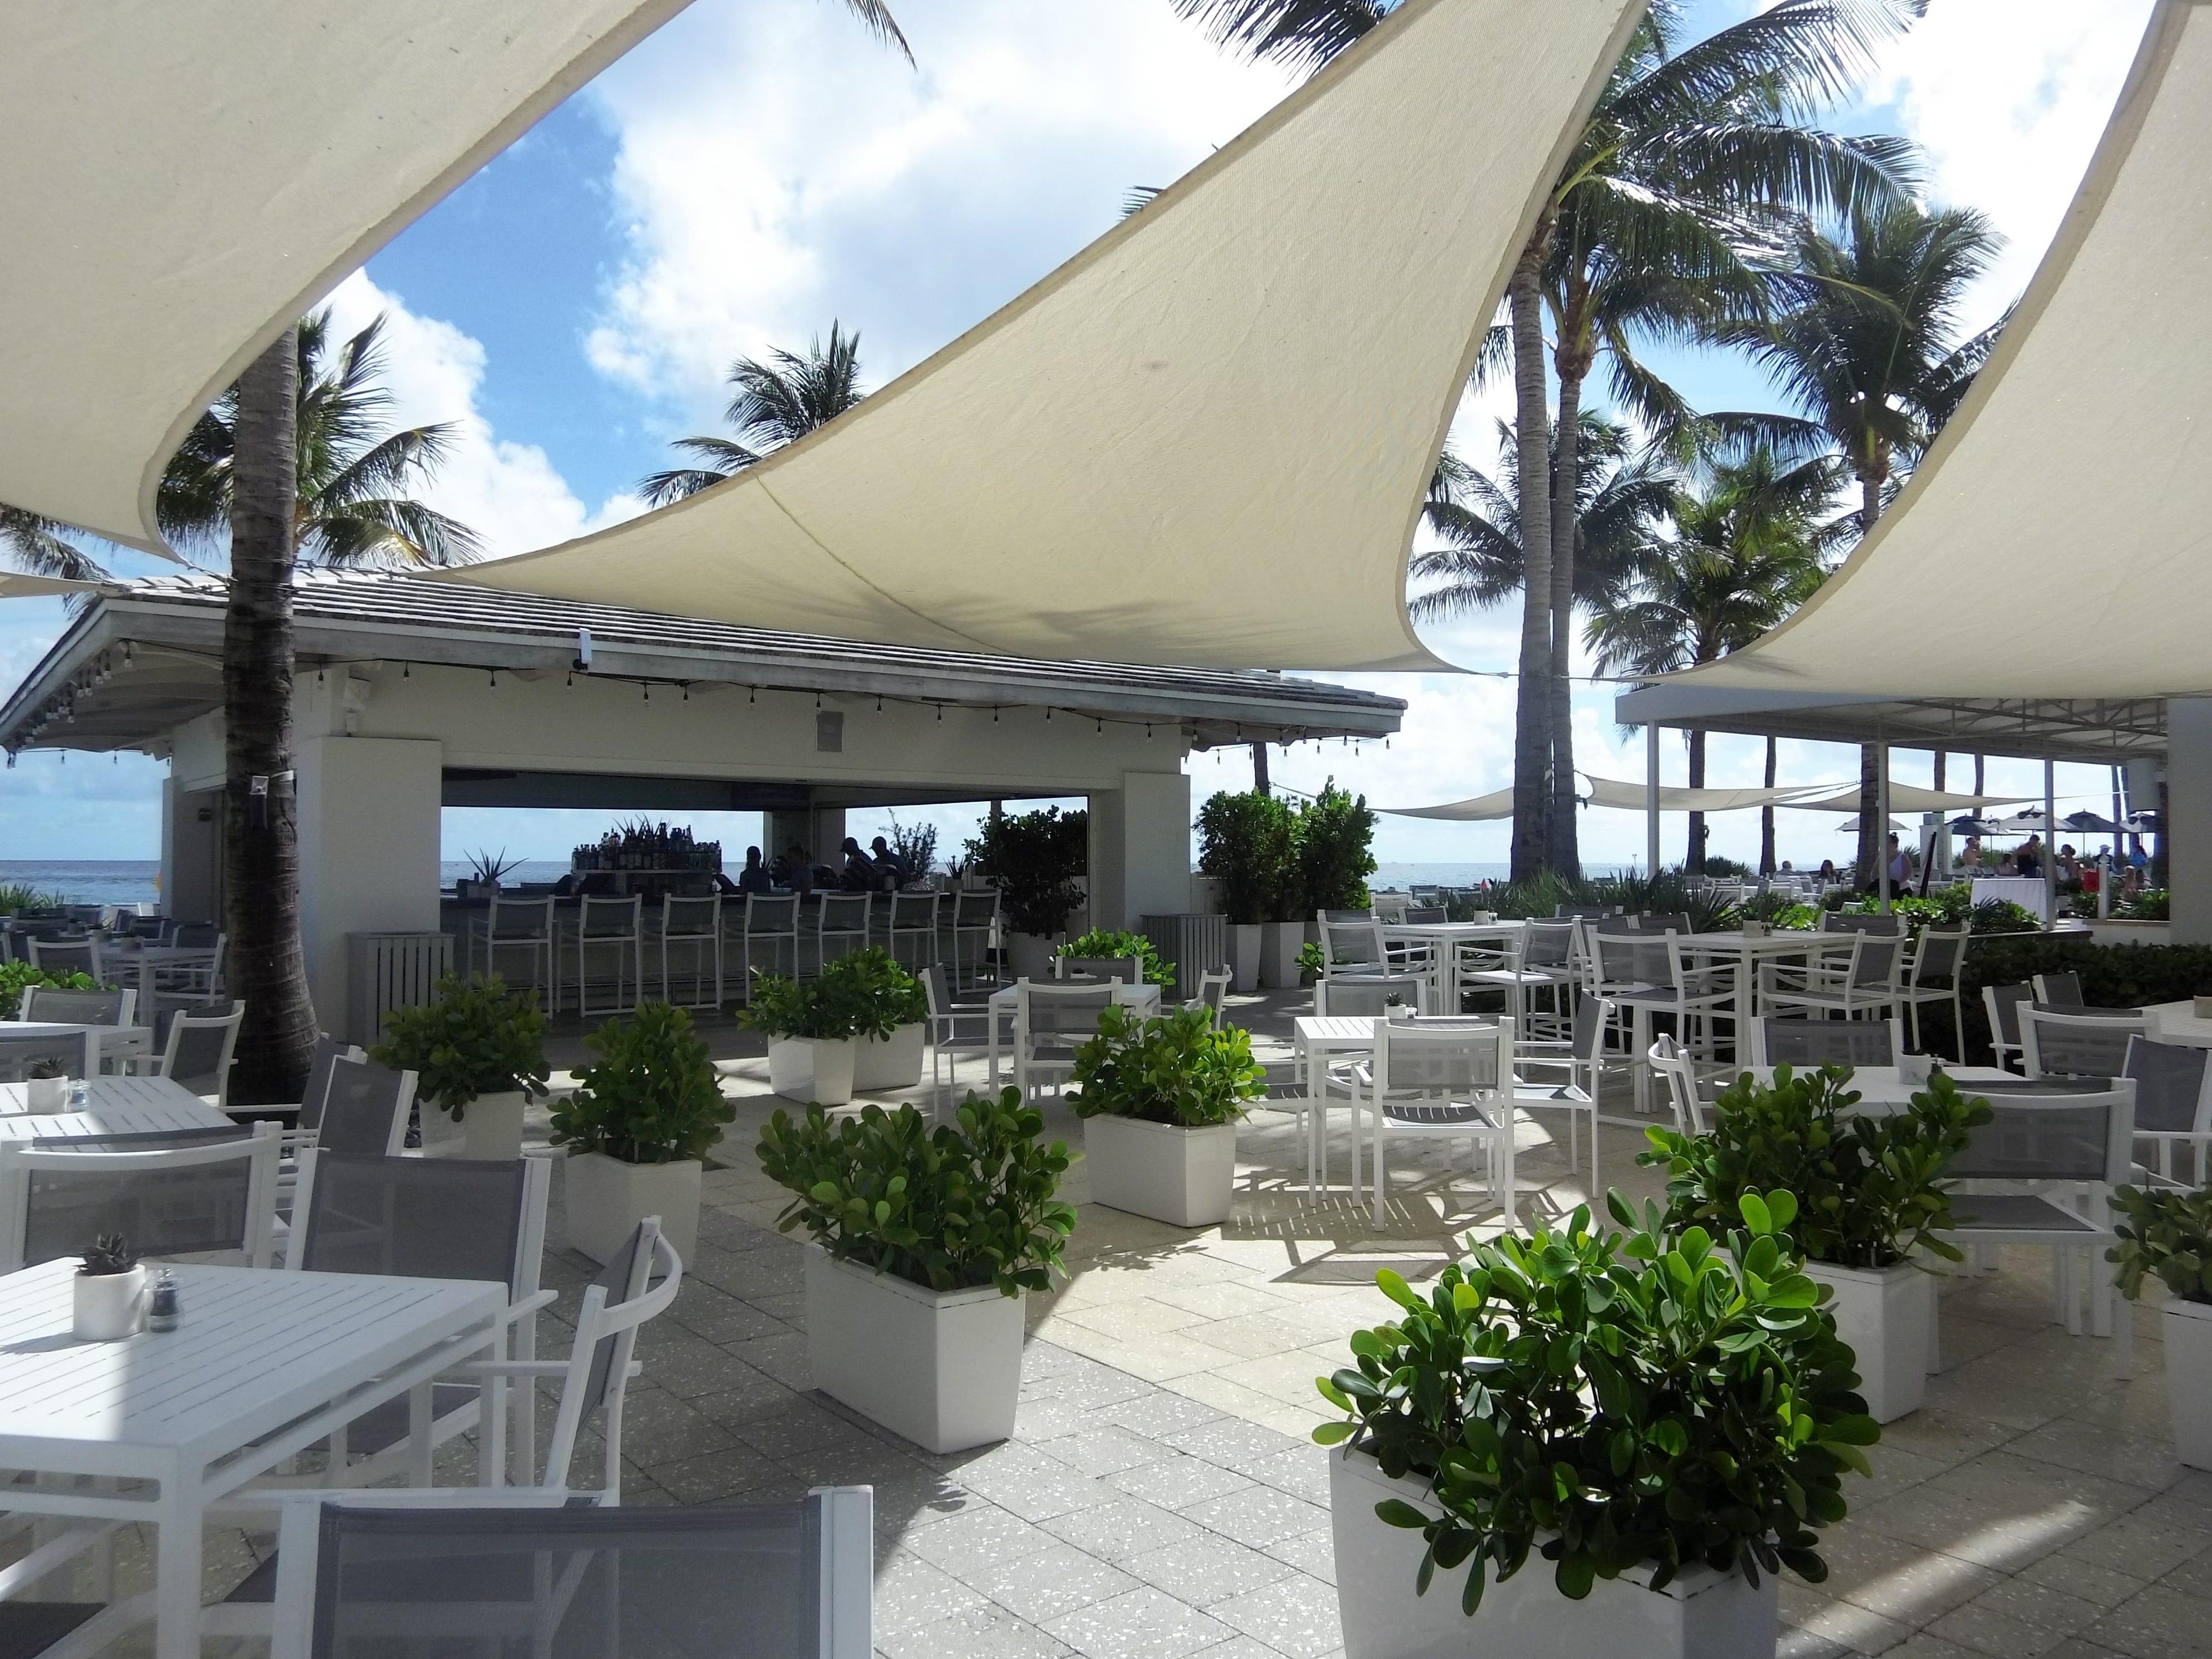 Outdoor seating at Beaches Restaurant and Bar at Boca Beach Club.